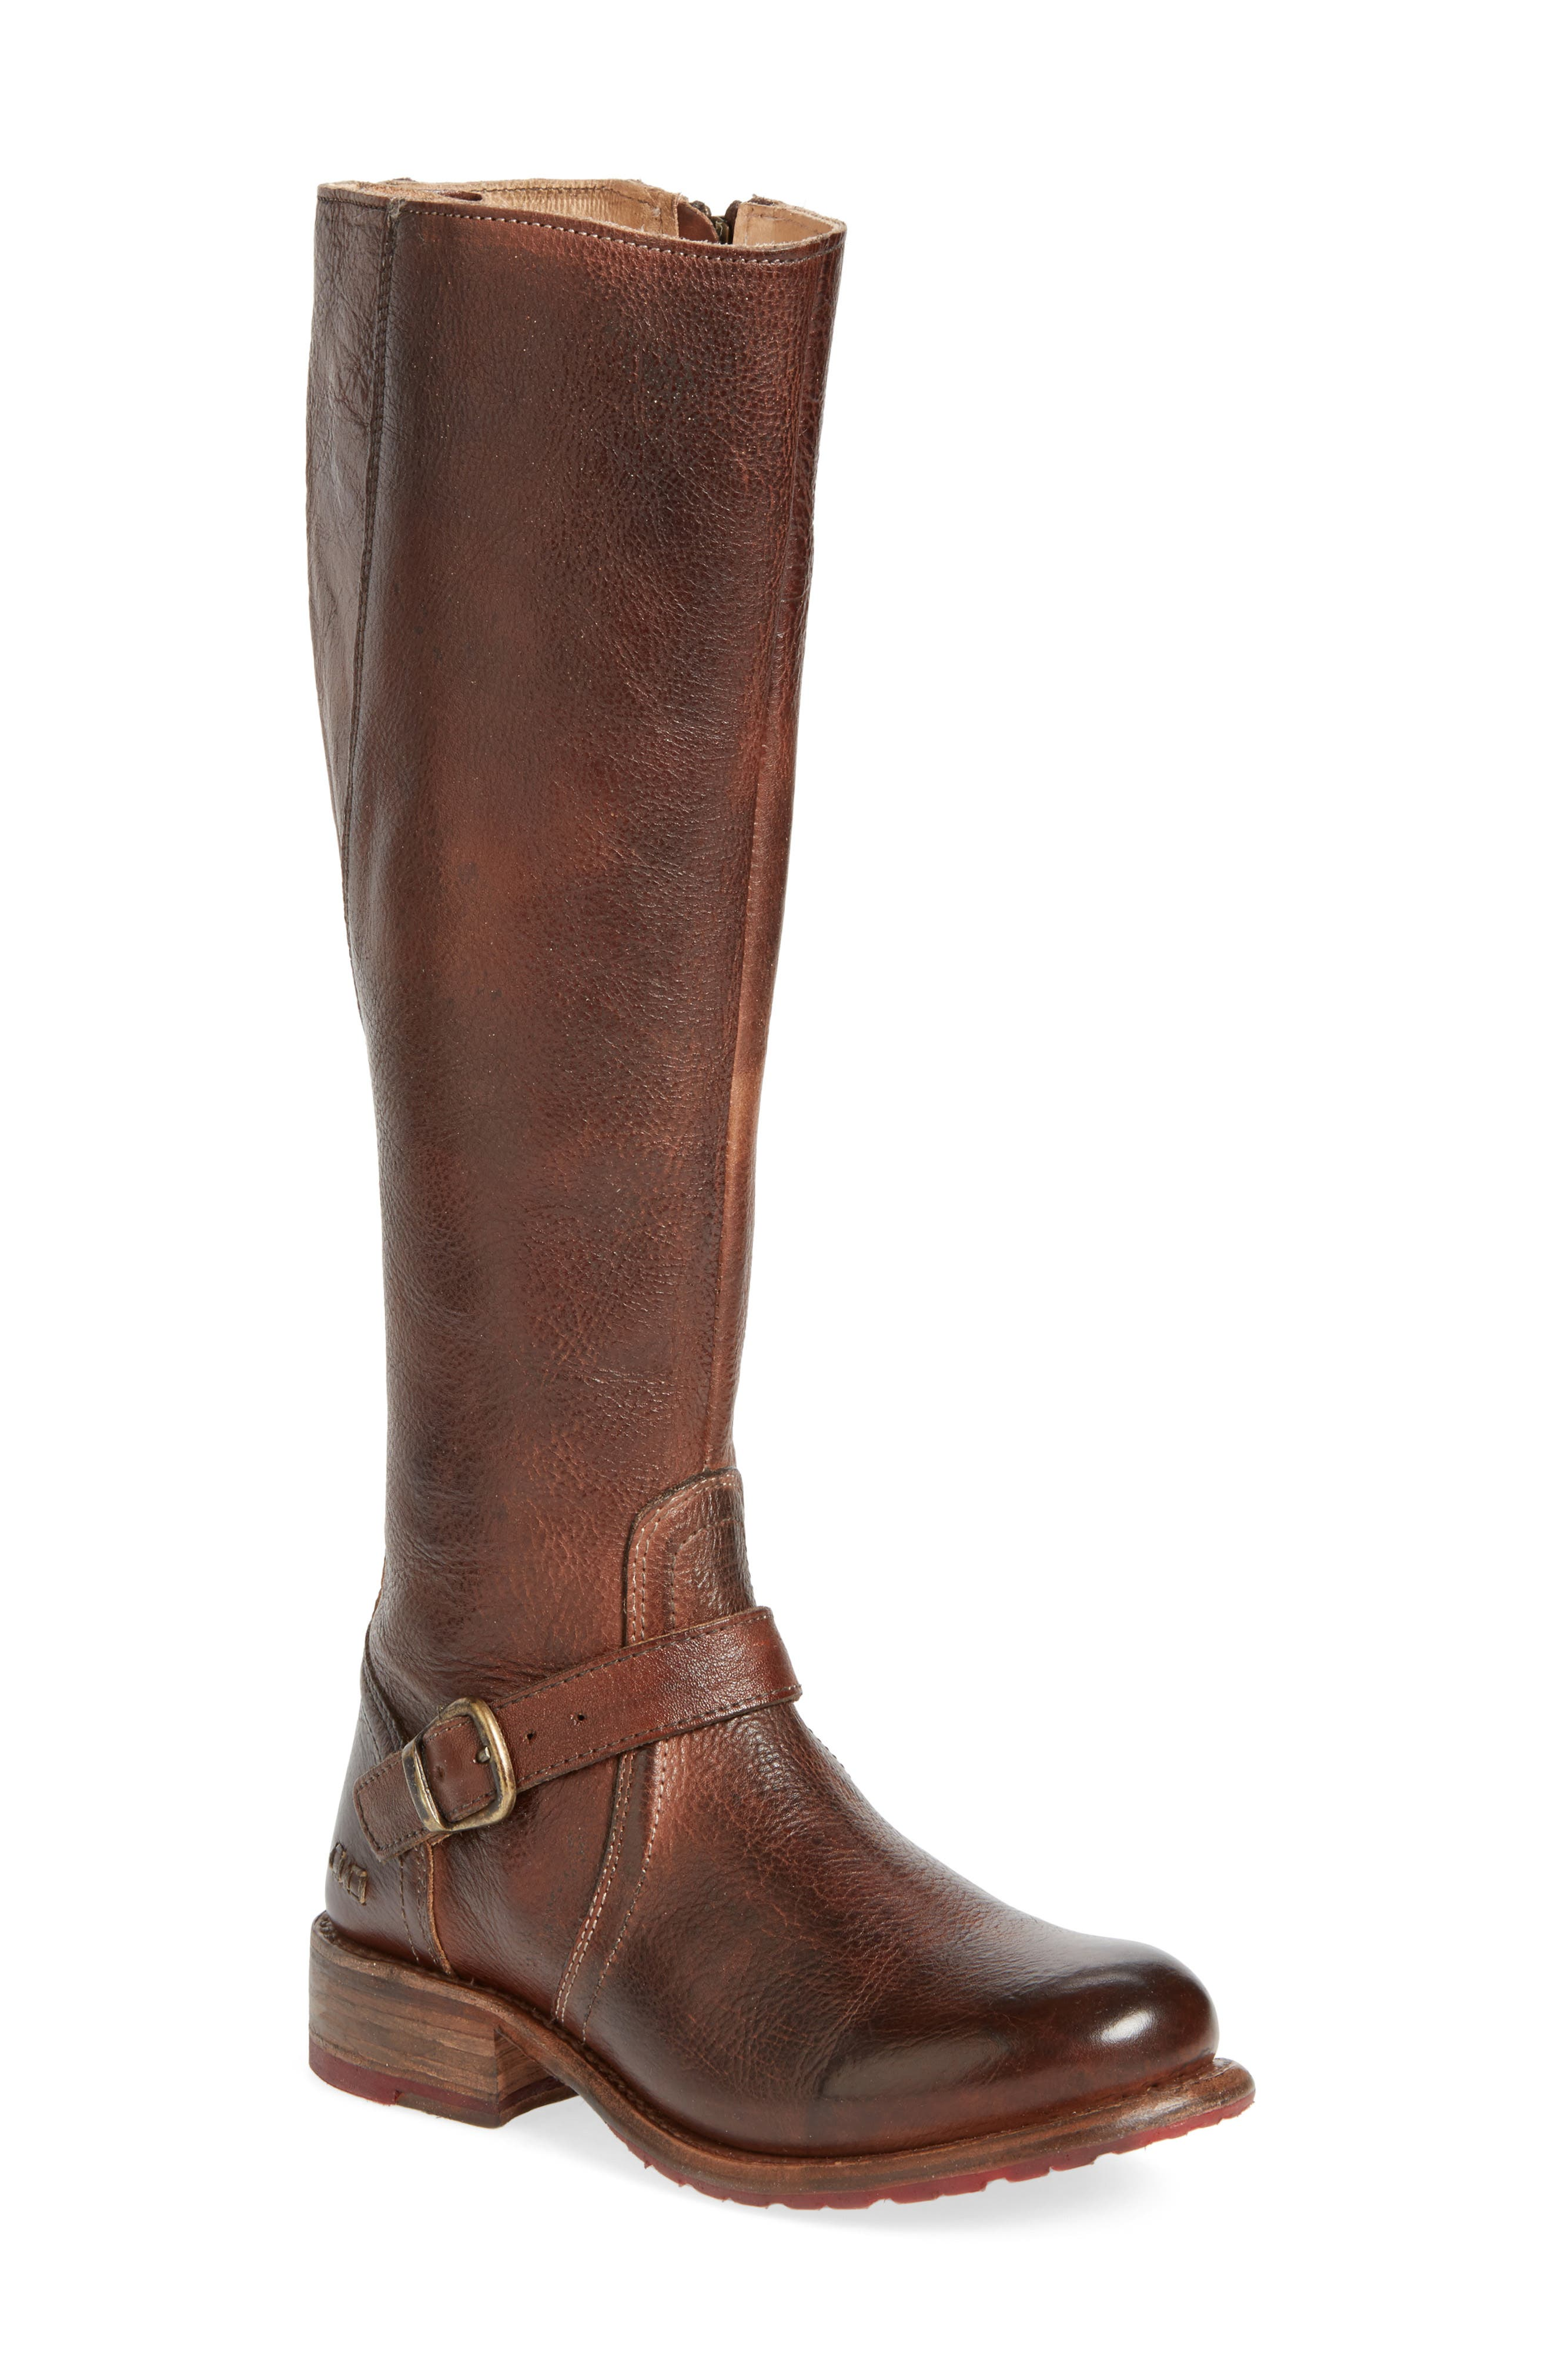 Main Image - Bed Stu 'Glaye' Tall Boot (Women)